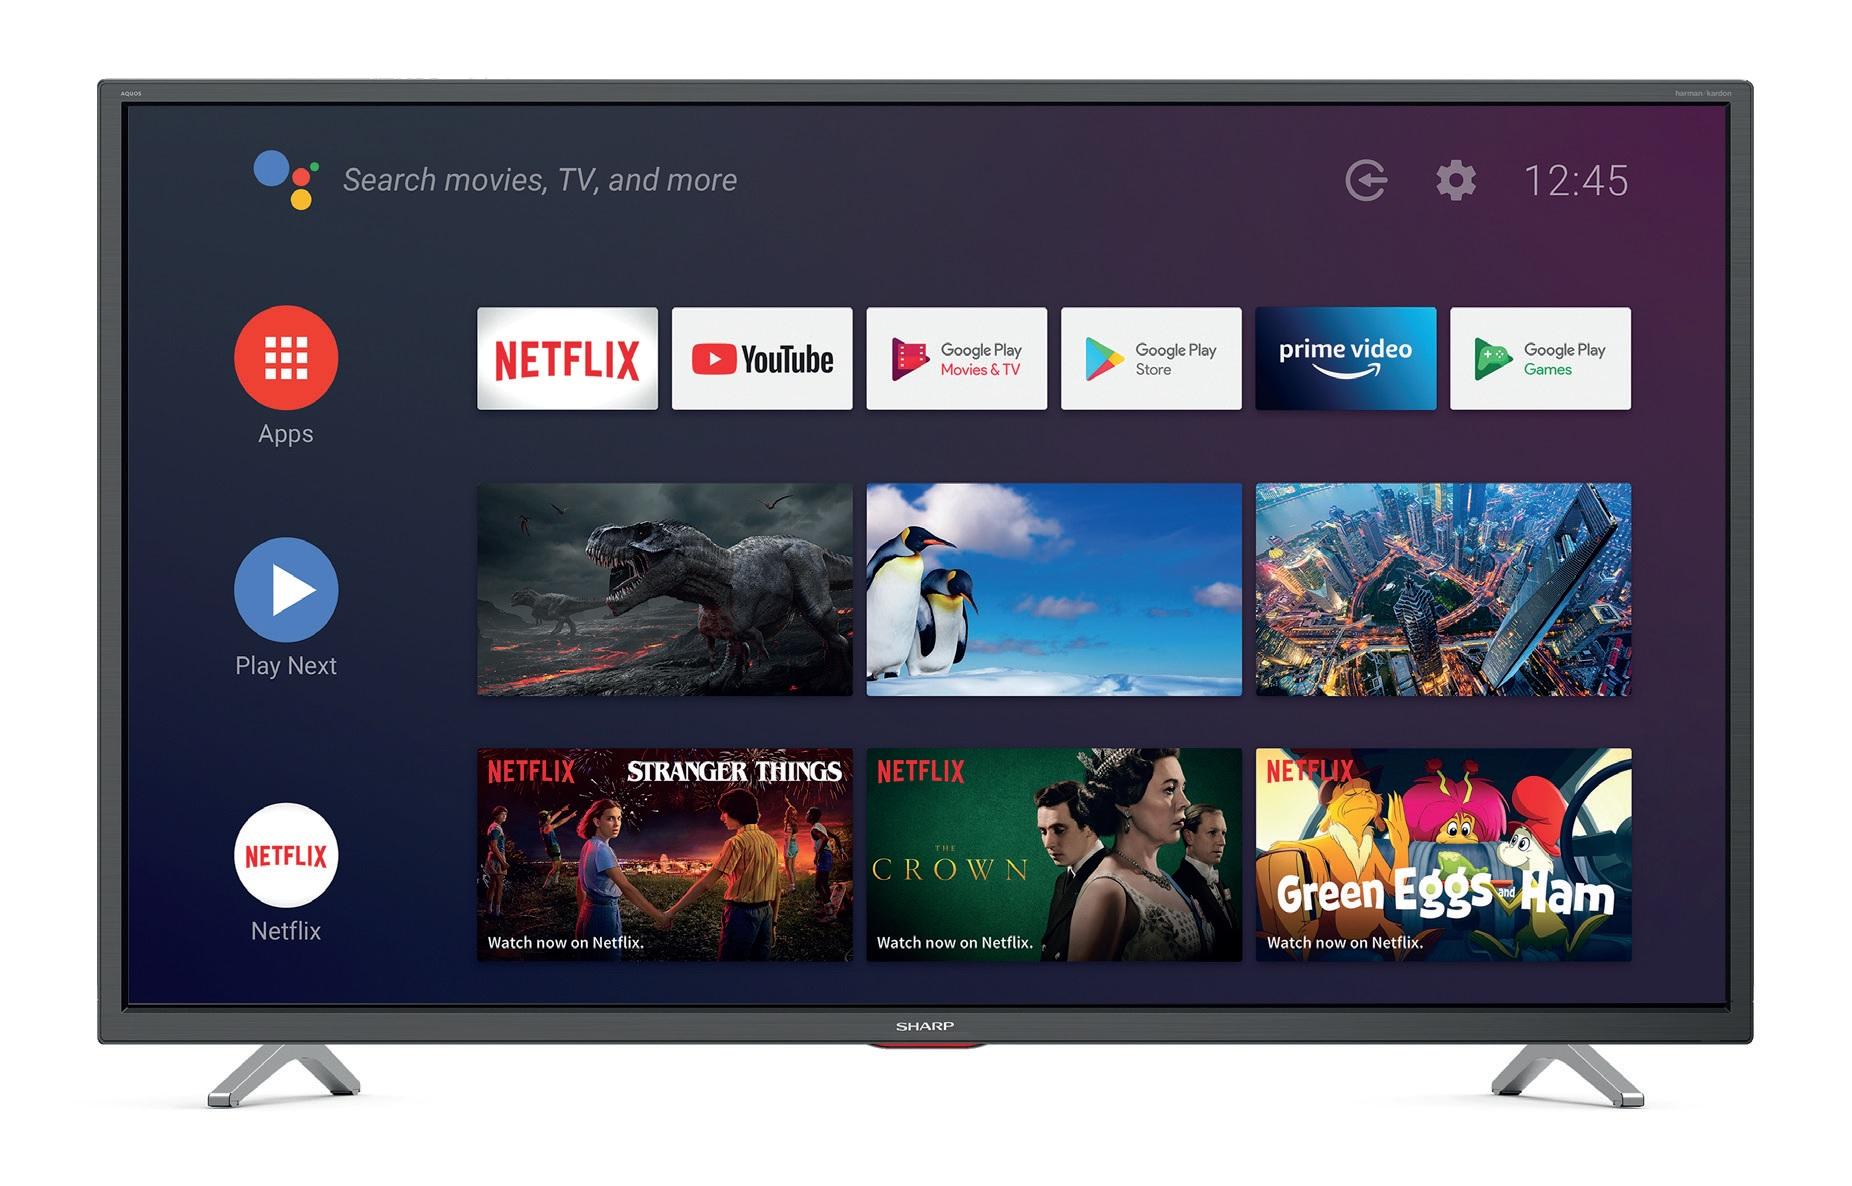 Sharp 32tum Android TV